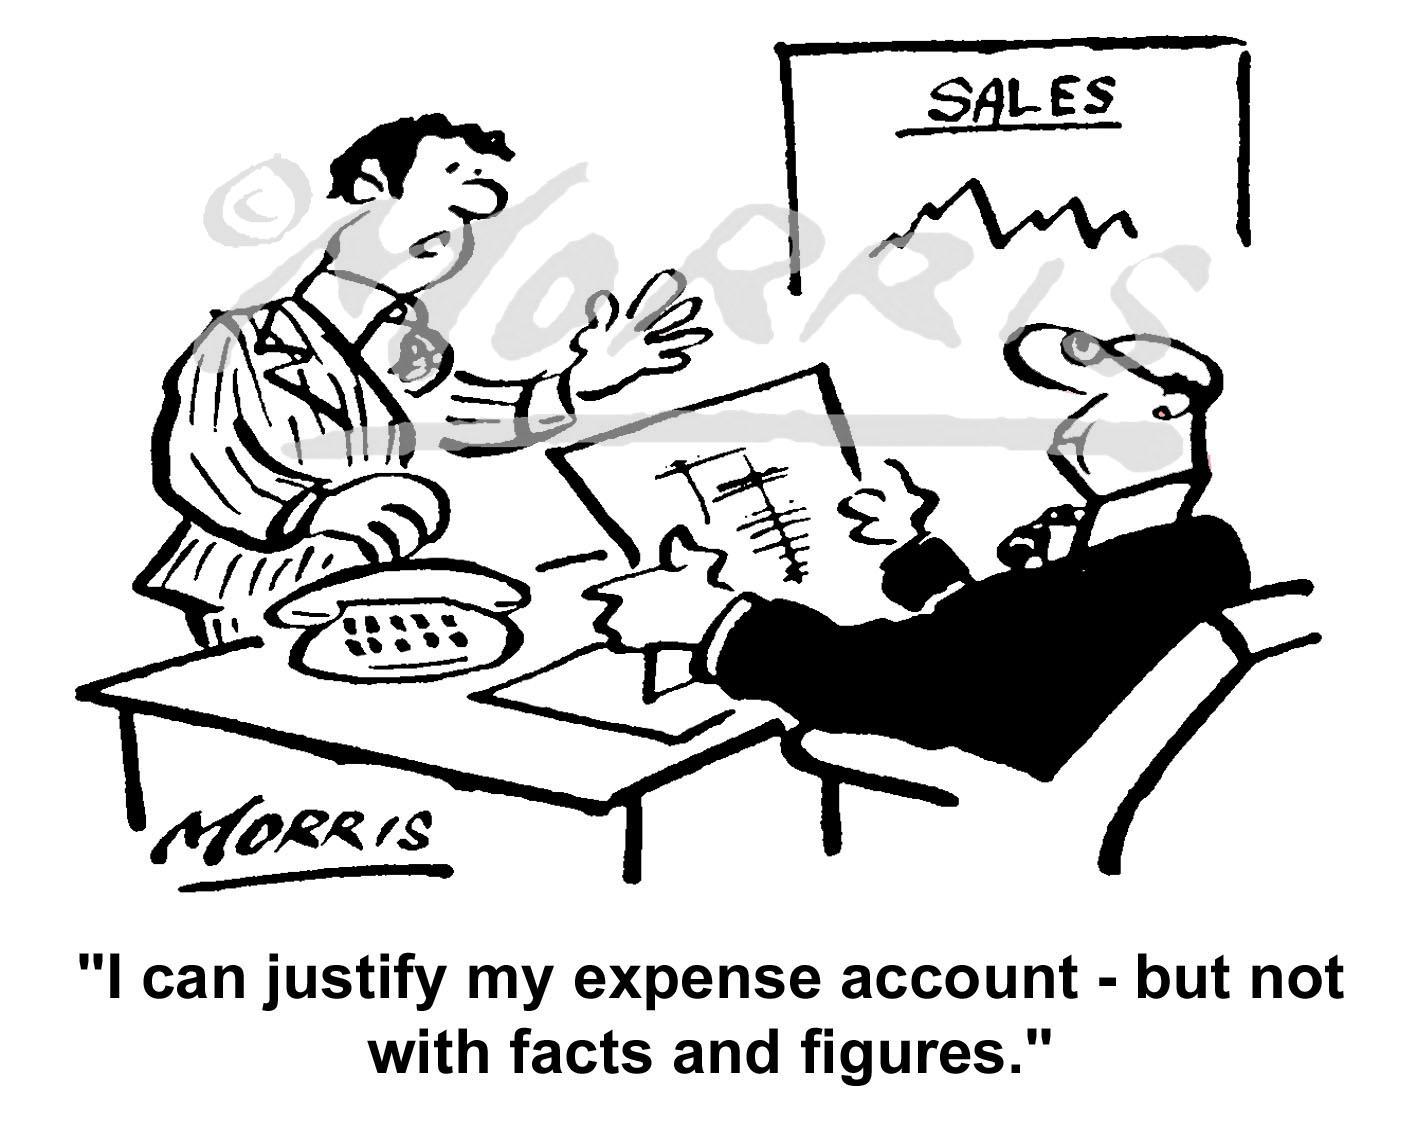 Business expense account cartoon Ref: 4311bw